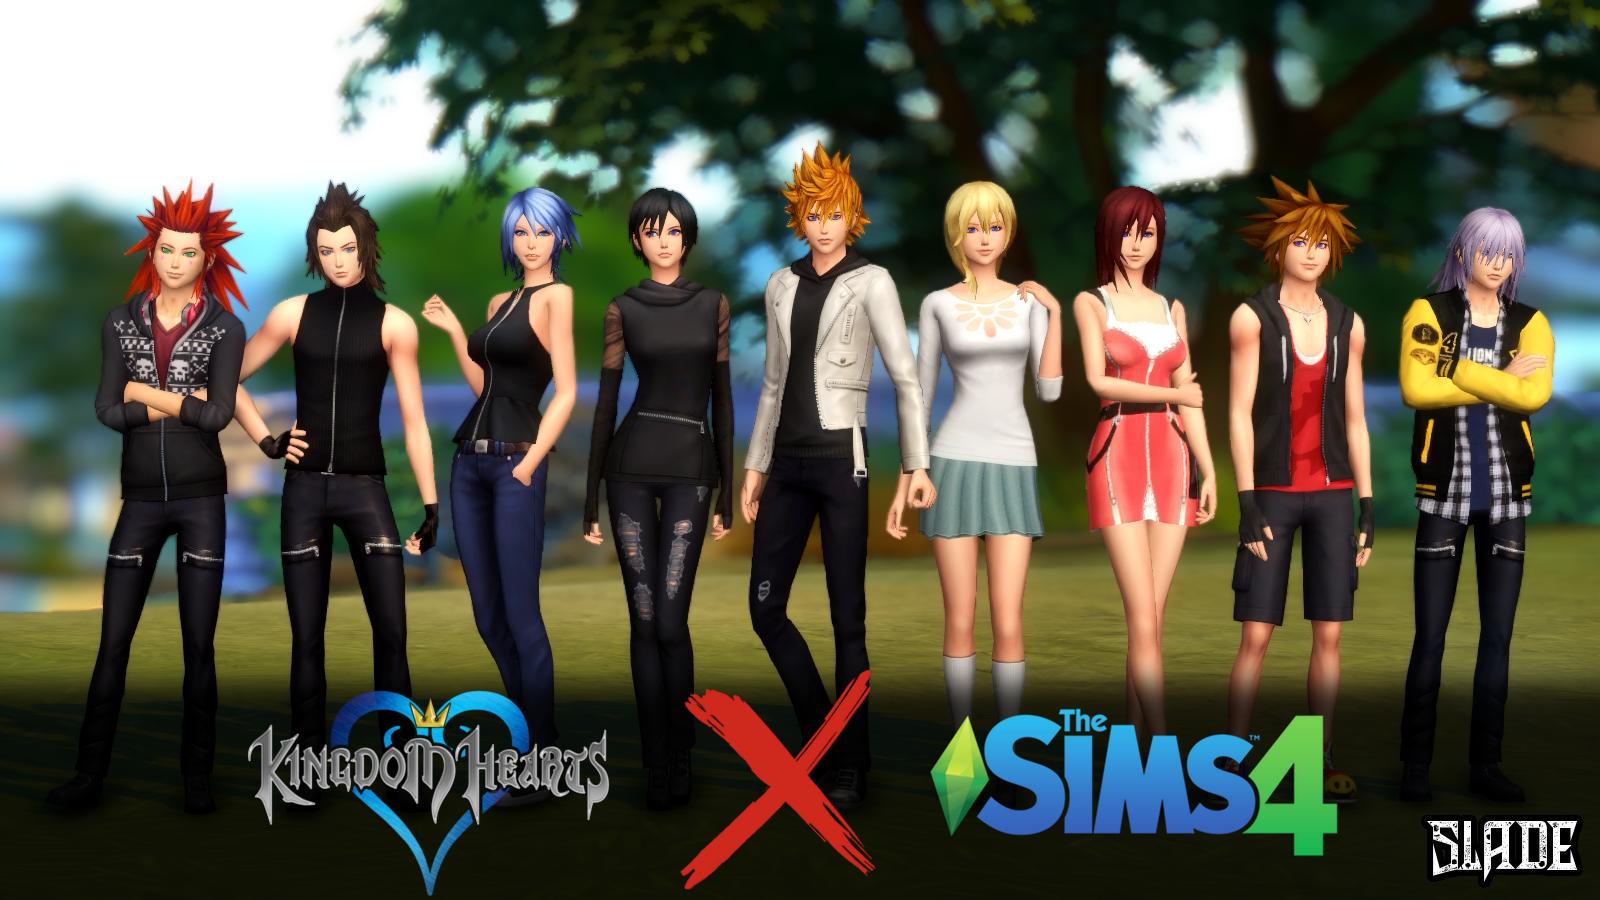 Sims 4 DL] Kingdom Hearts CC Set by Tx-Slade-xT on DeviantArt